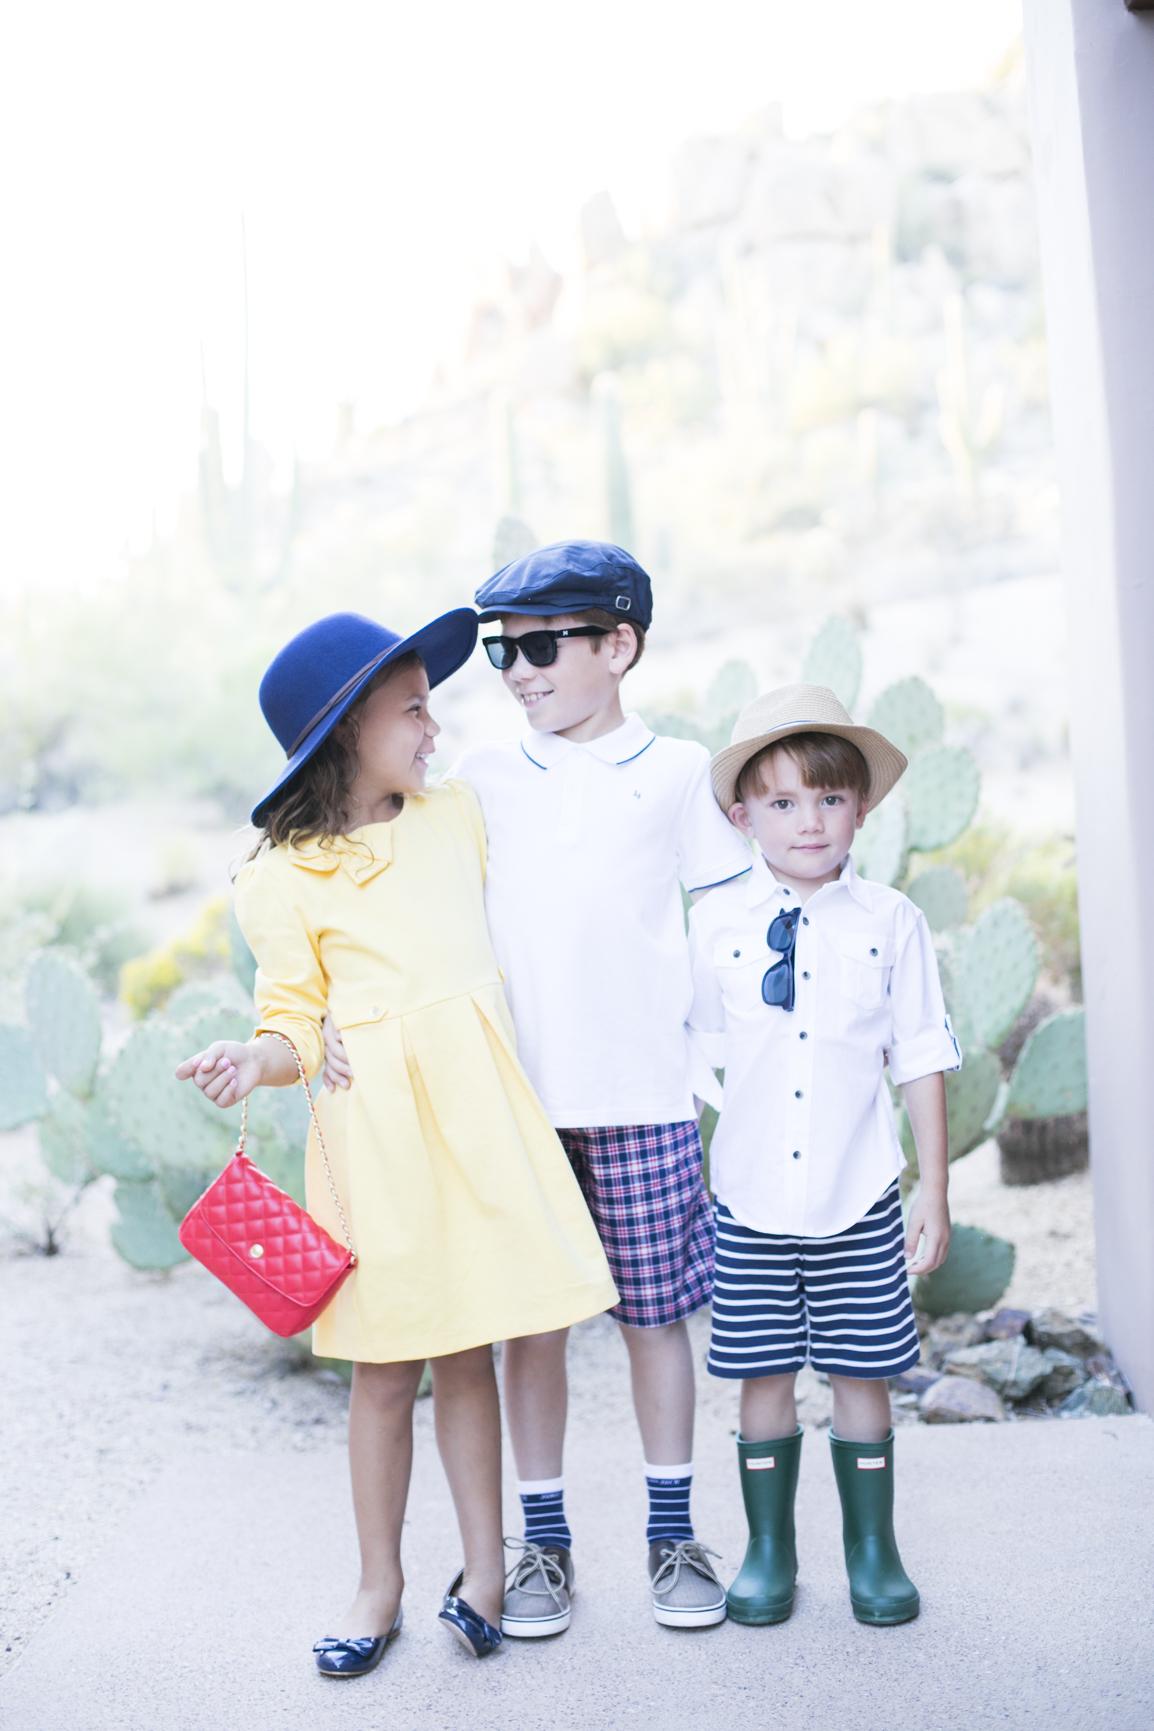 Children's Fashion Janie and Jack